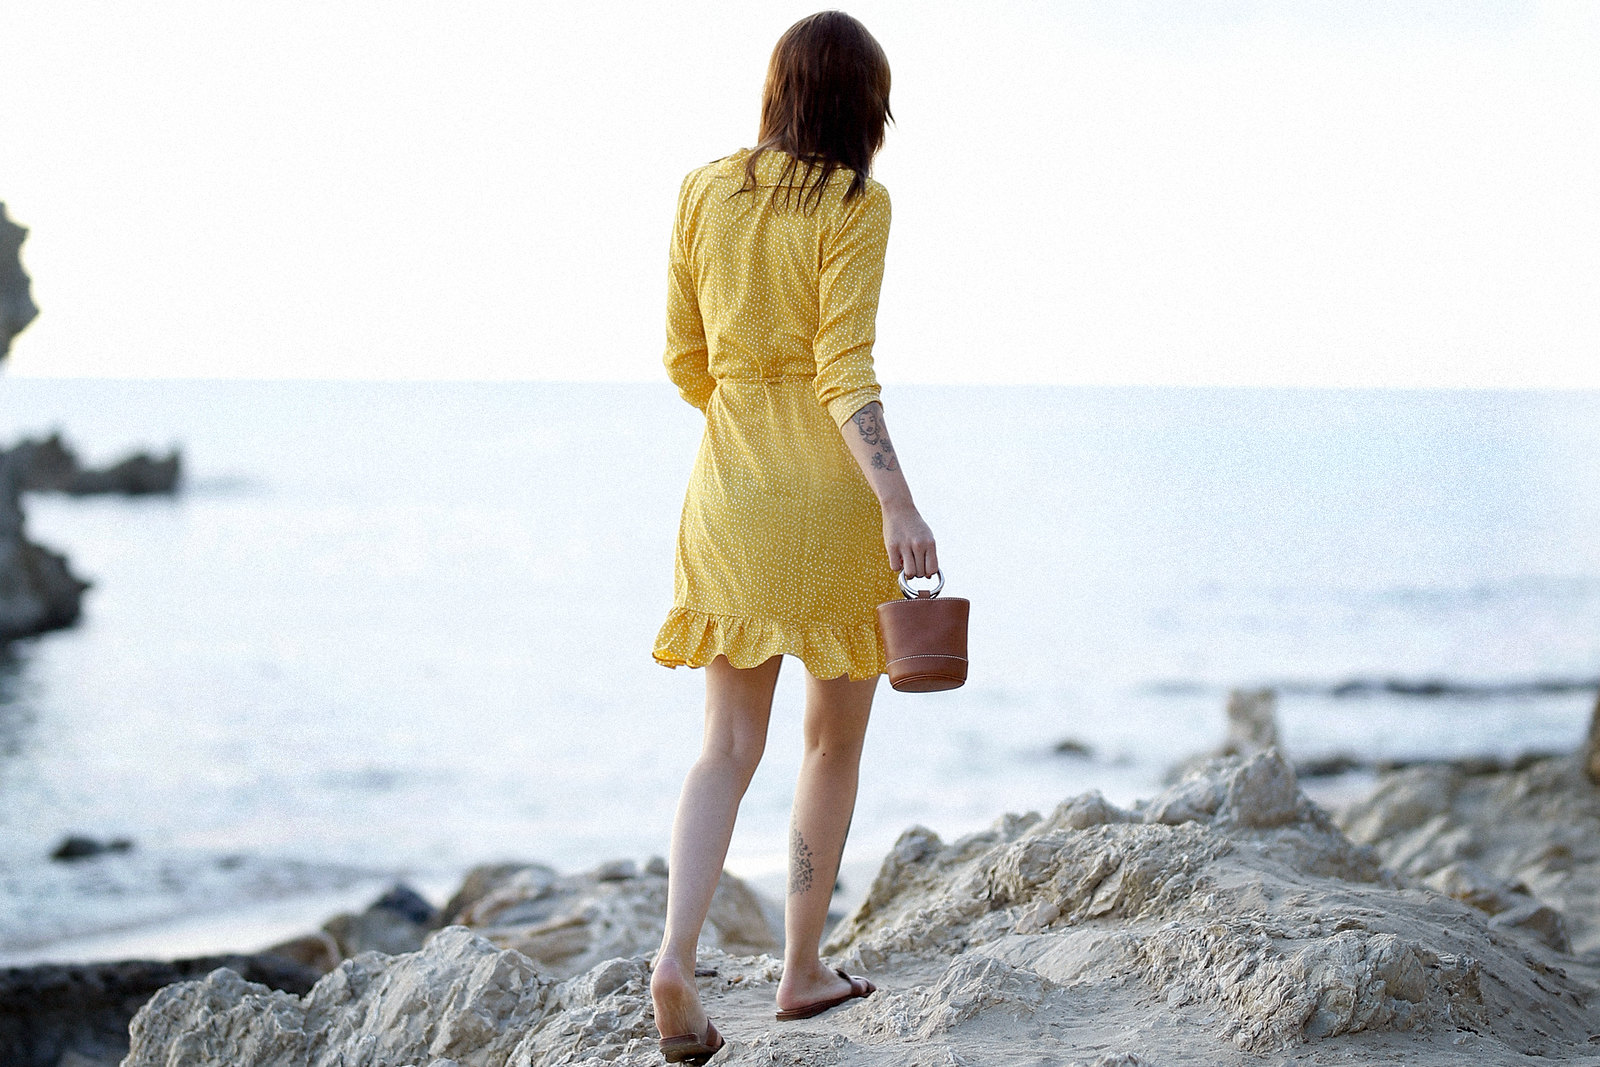 vila yellow mustard polka dot dress mallorca holiday beach sunrise moody style fashionblogger cats & dogs modeblog ricarda schernus fotograf max bechmann düsseldorf travelbloggers roamers 4